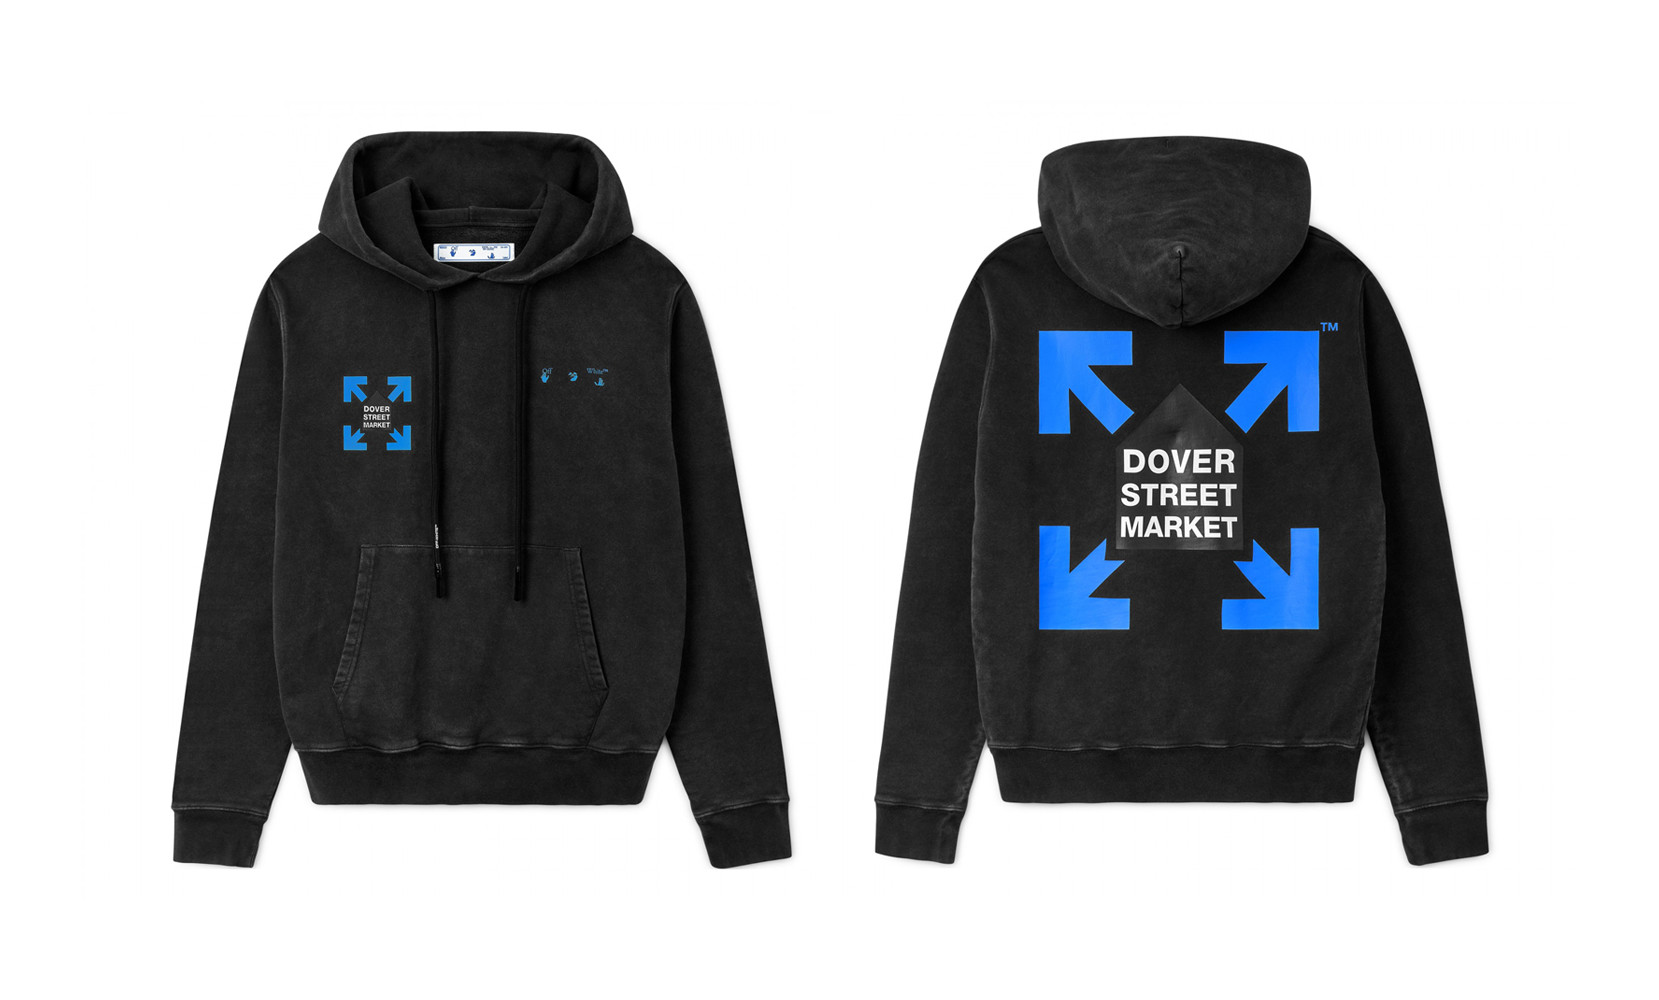 Off-White x Dover Street Market hoodie